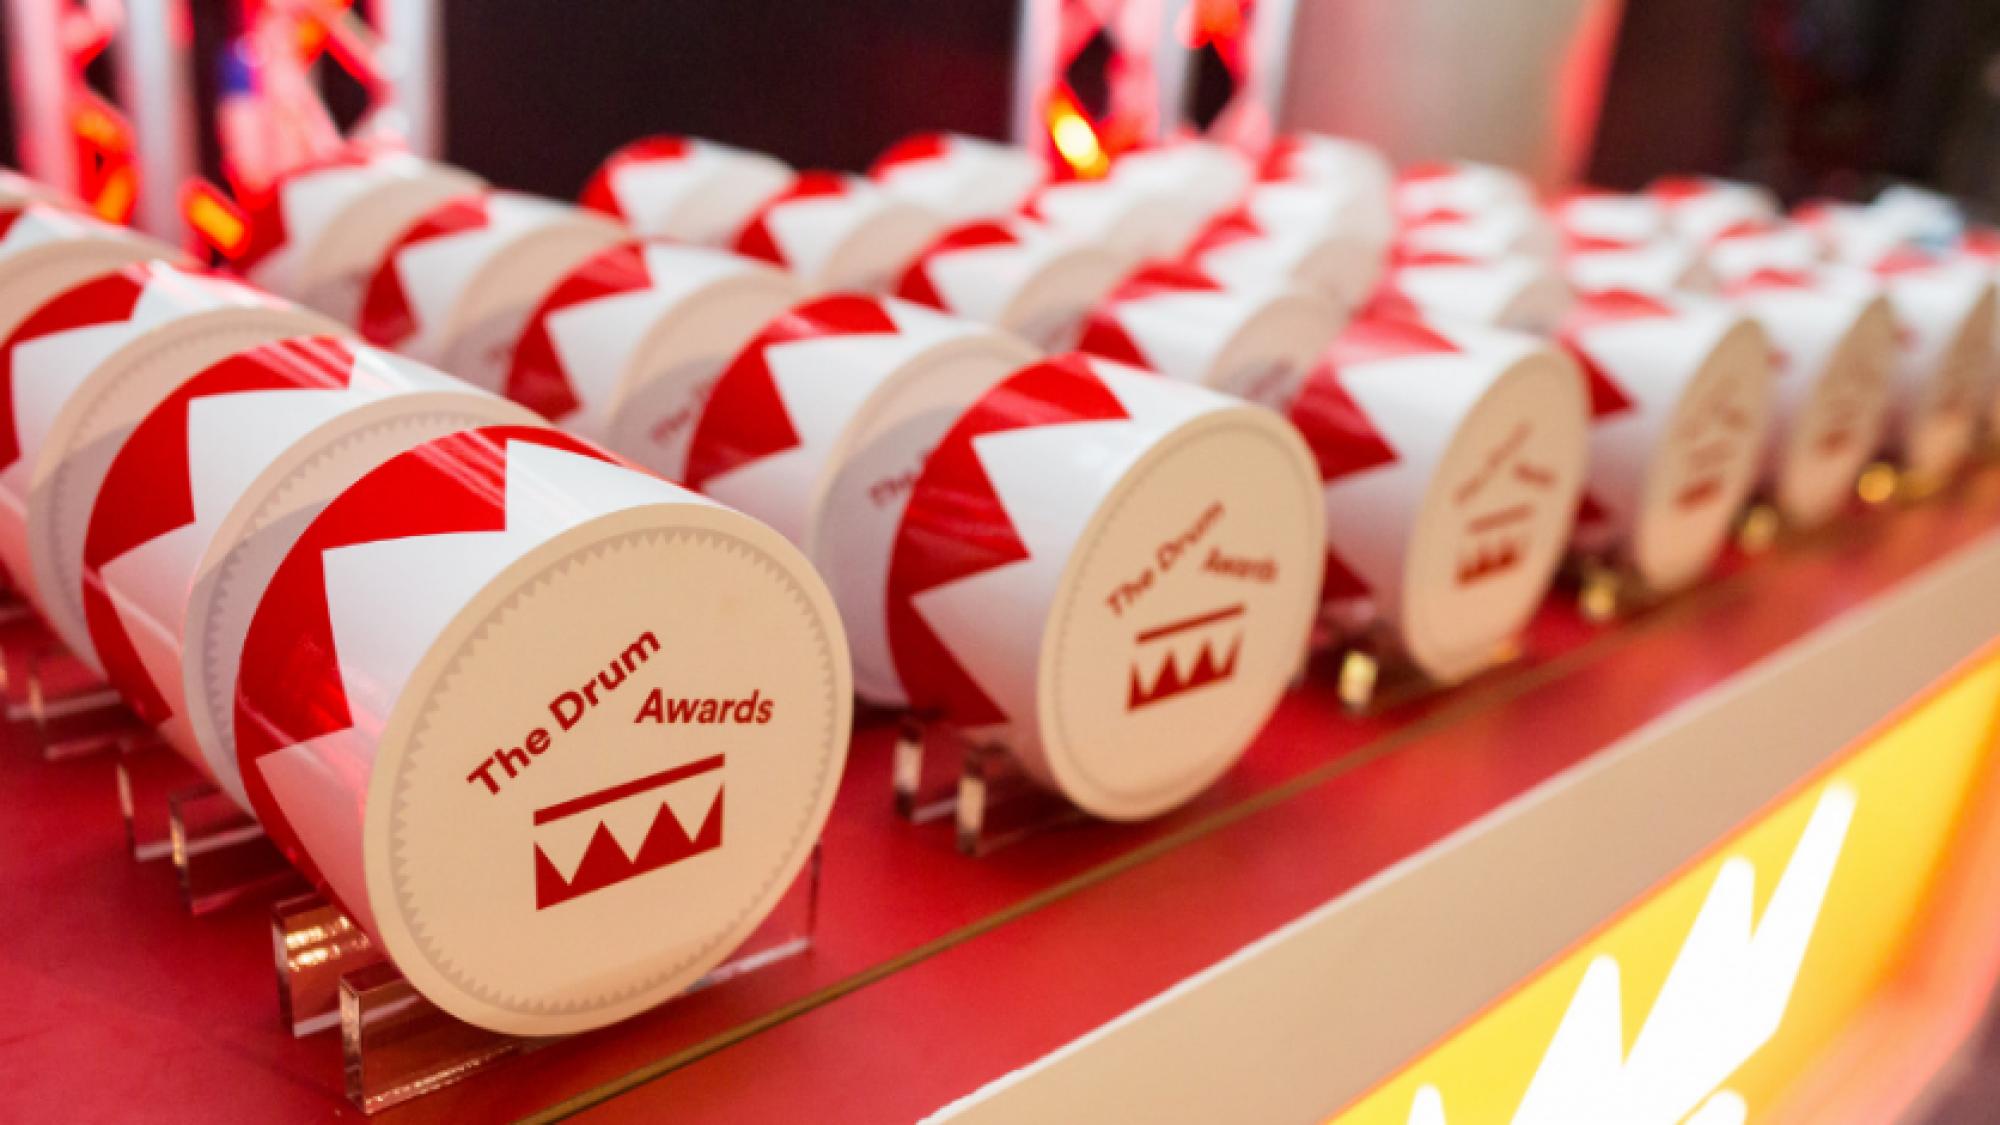 The Drum Social Purpose Awards 2019 - Trophies